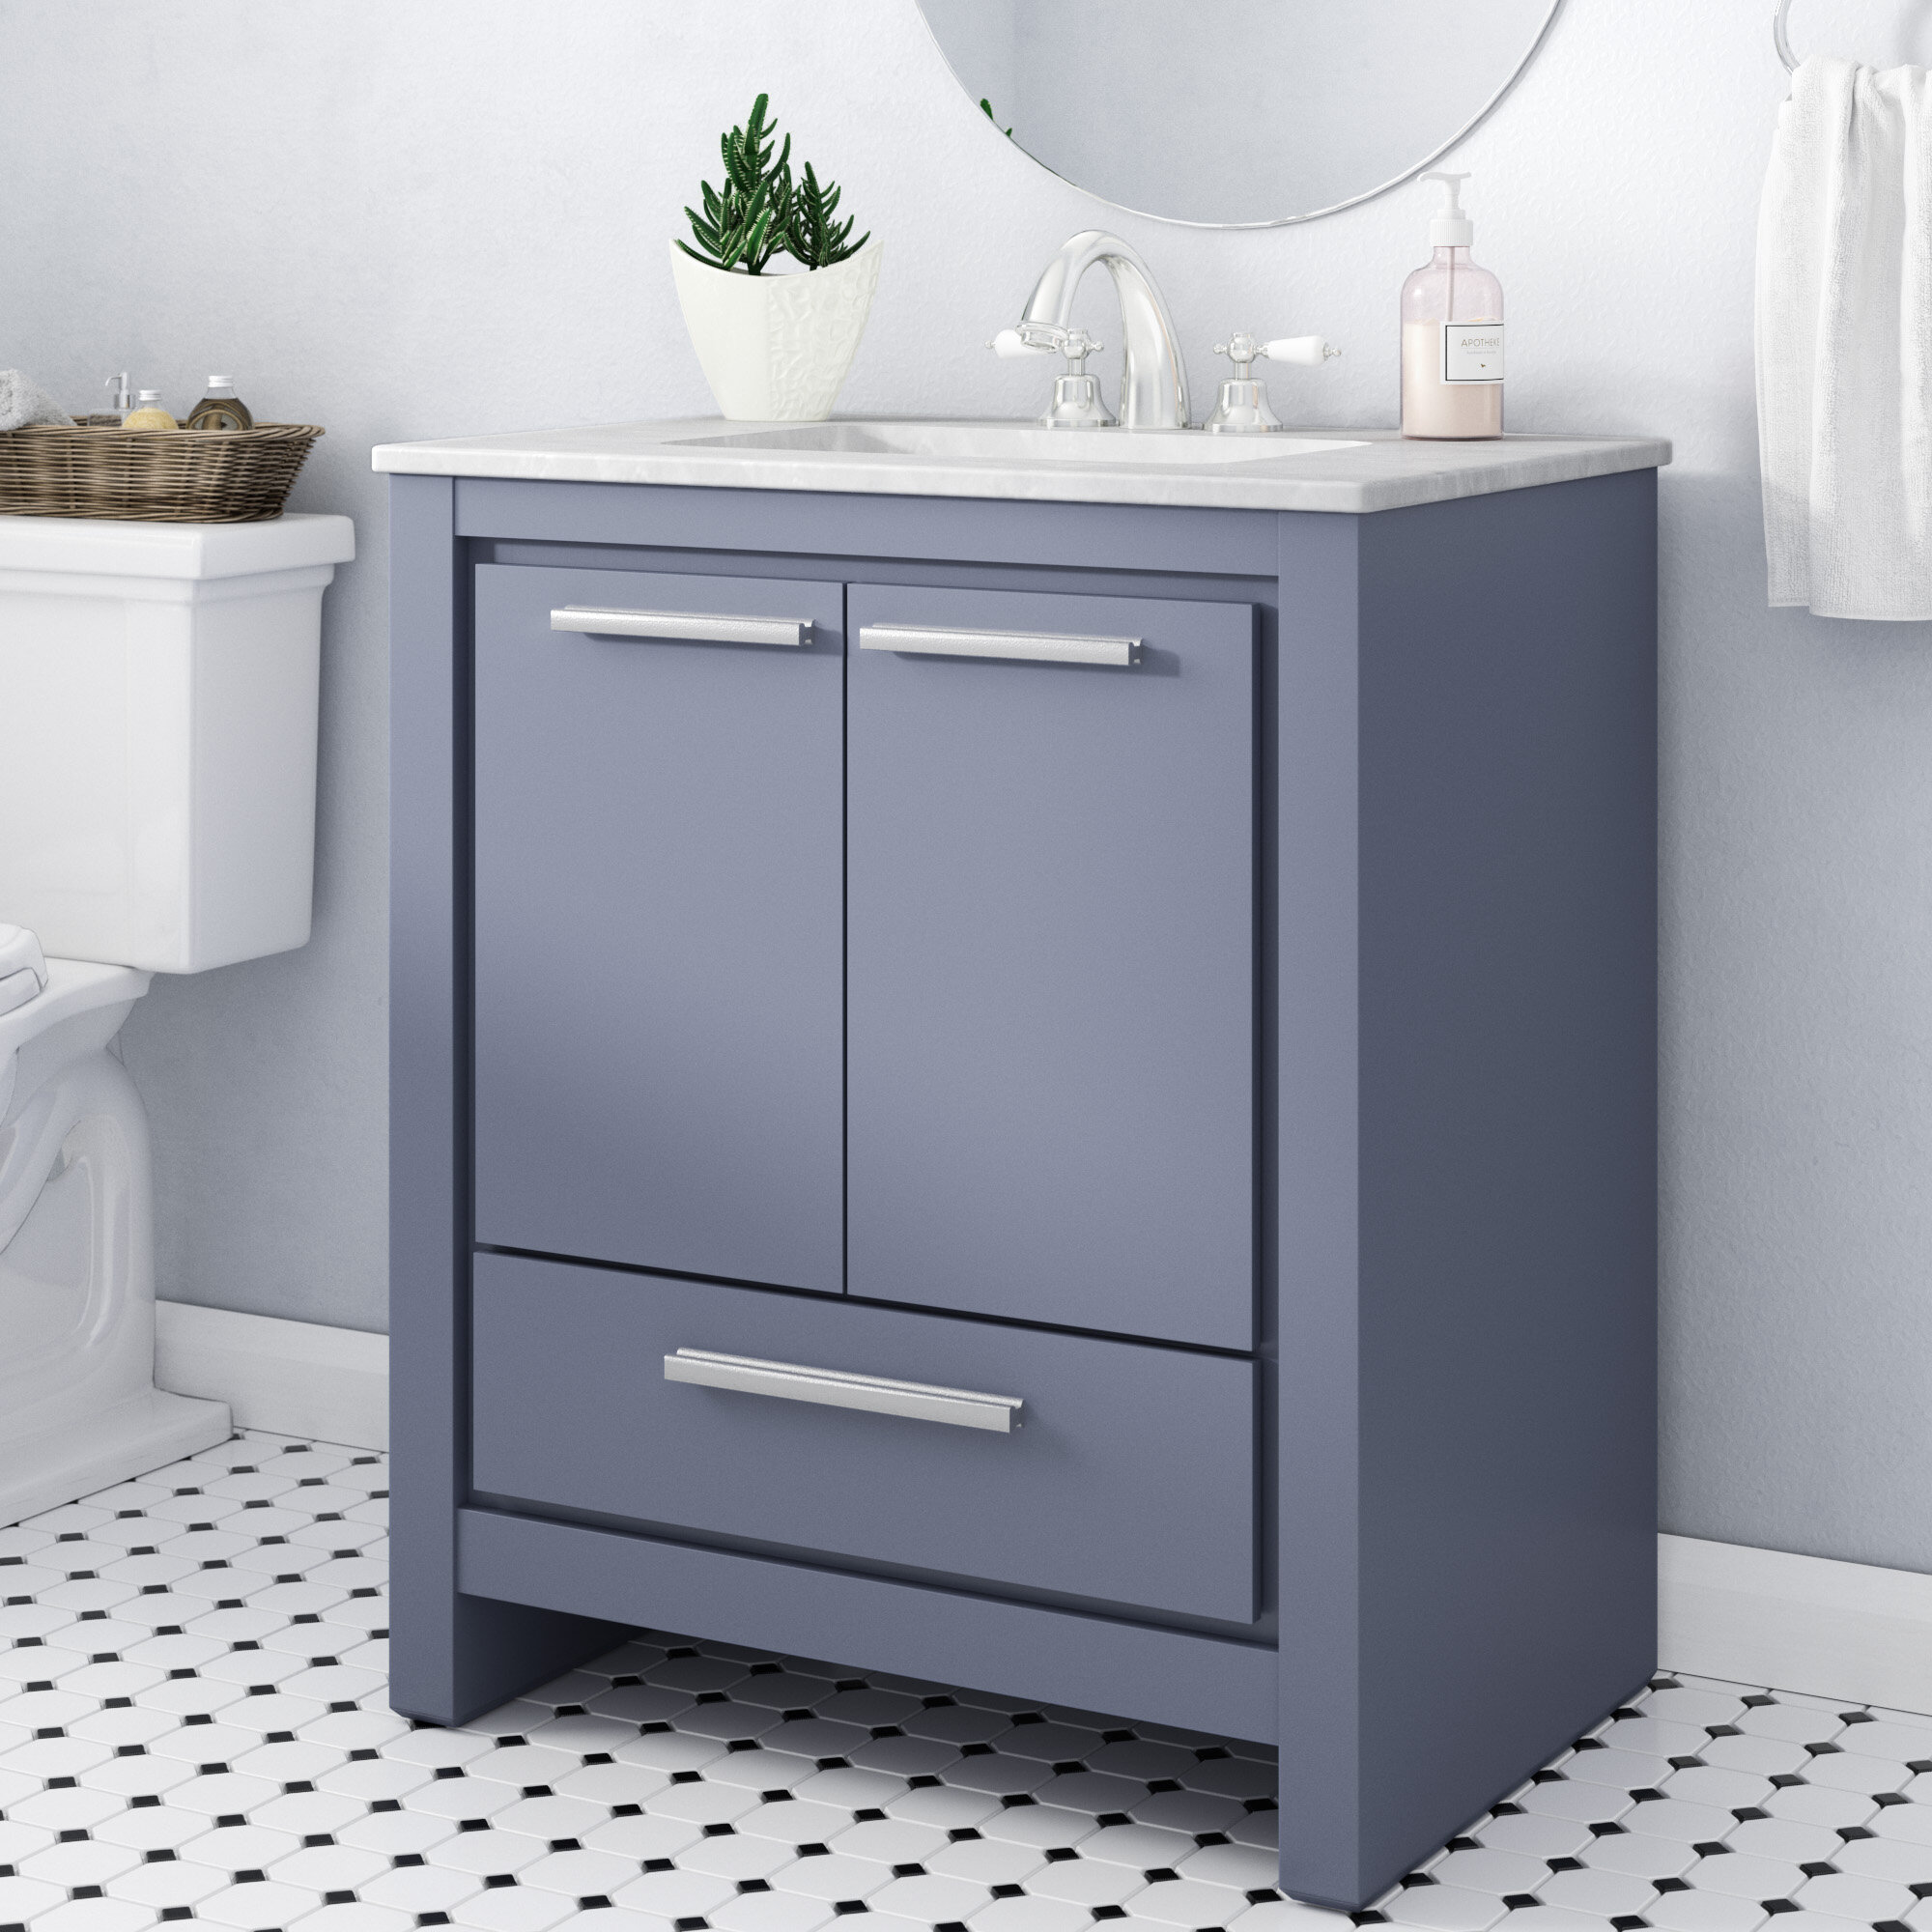 single drawer file chocolate vanity cabinet kbc zelda quartz products inch farmhouse